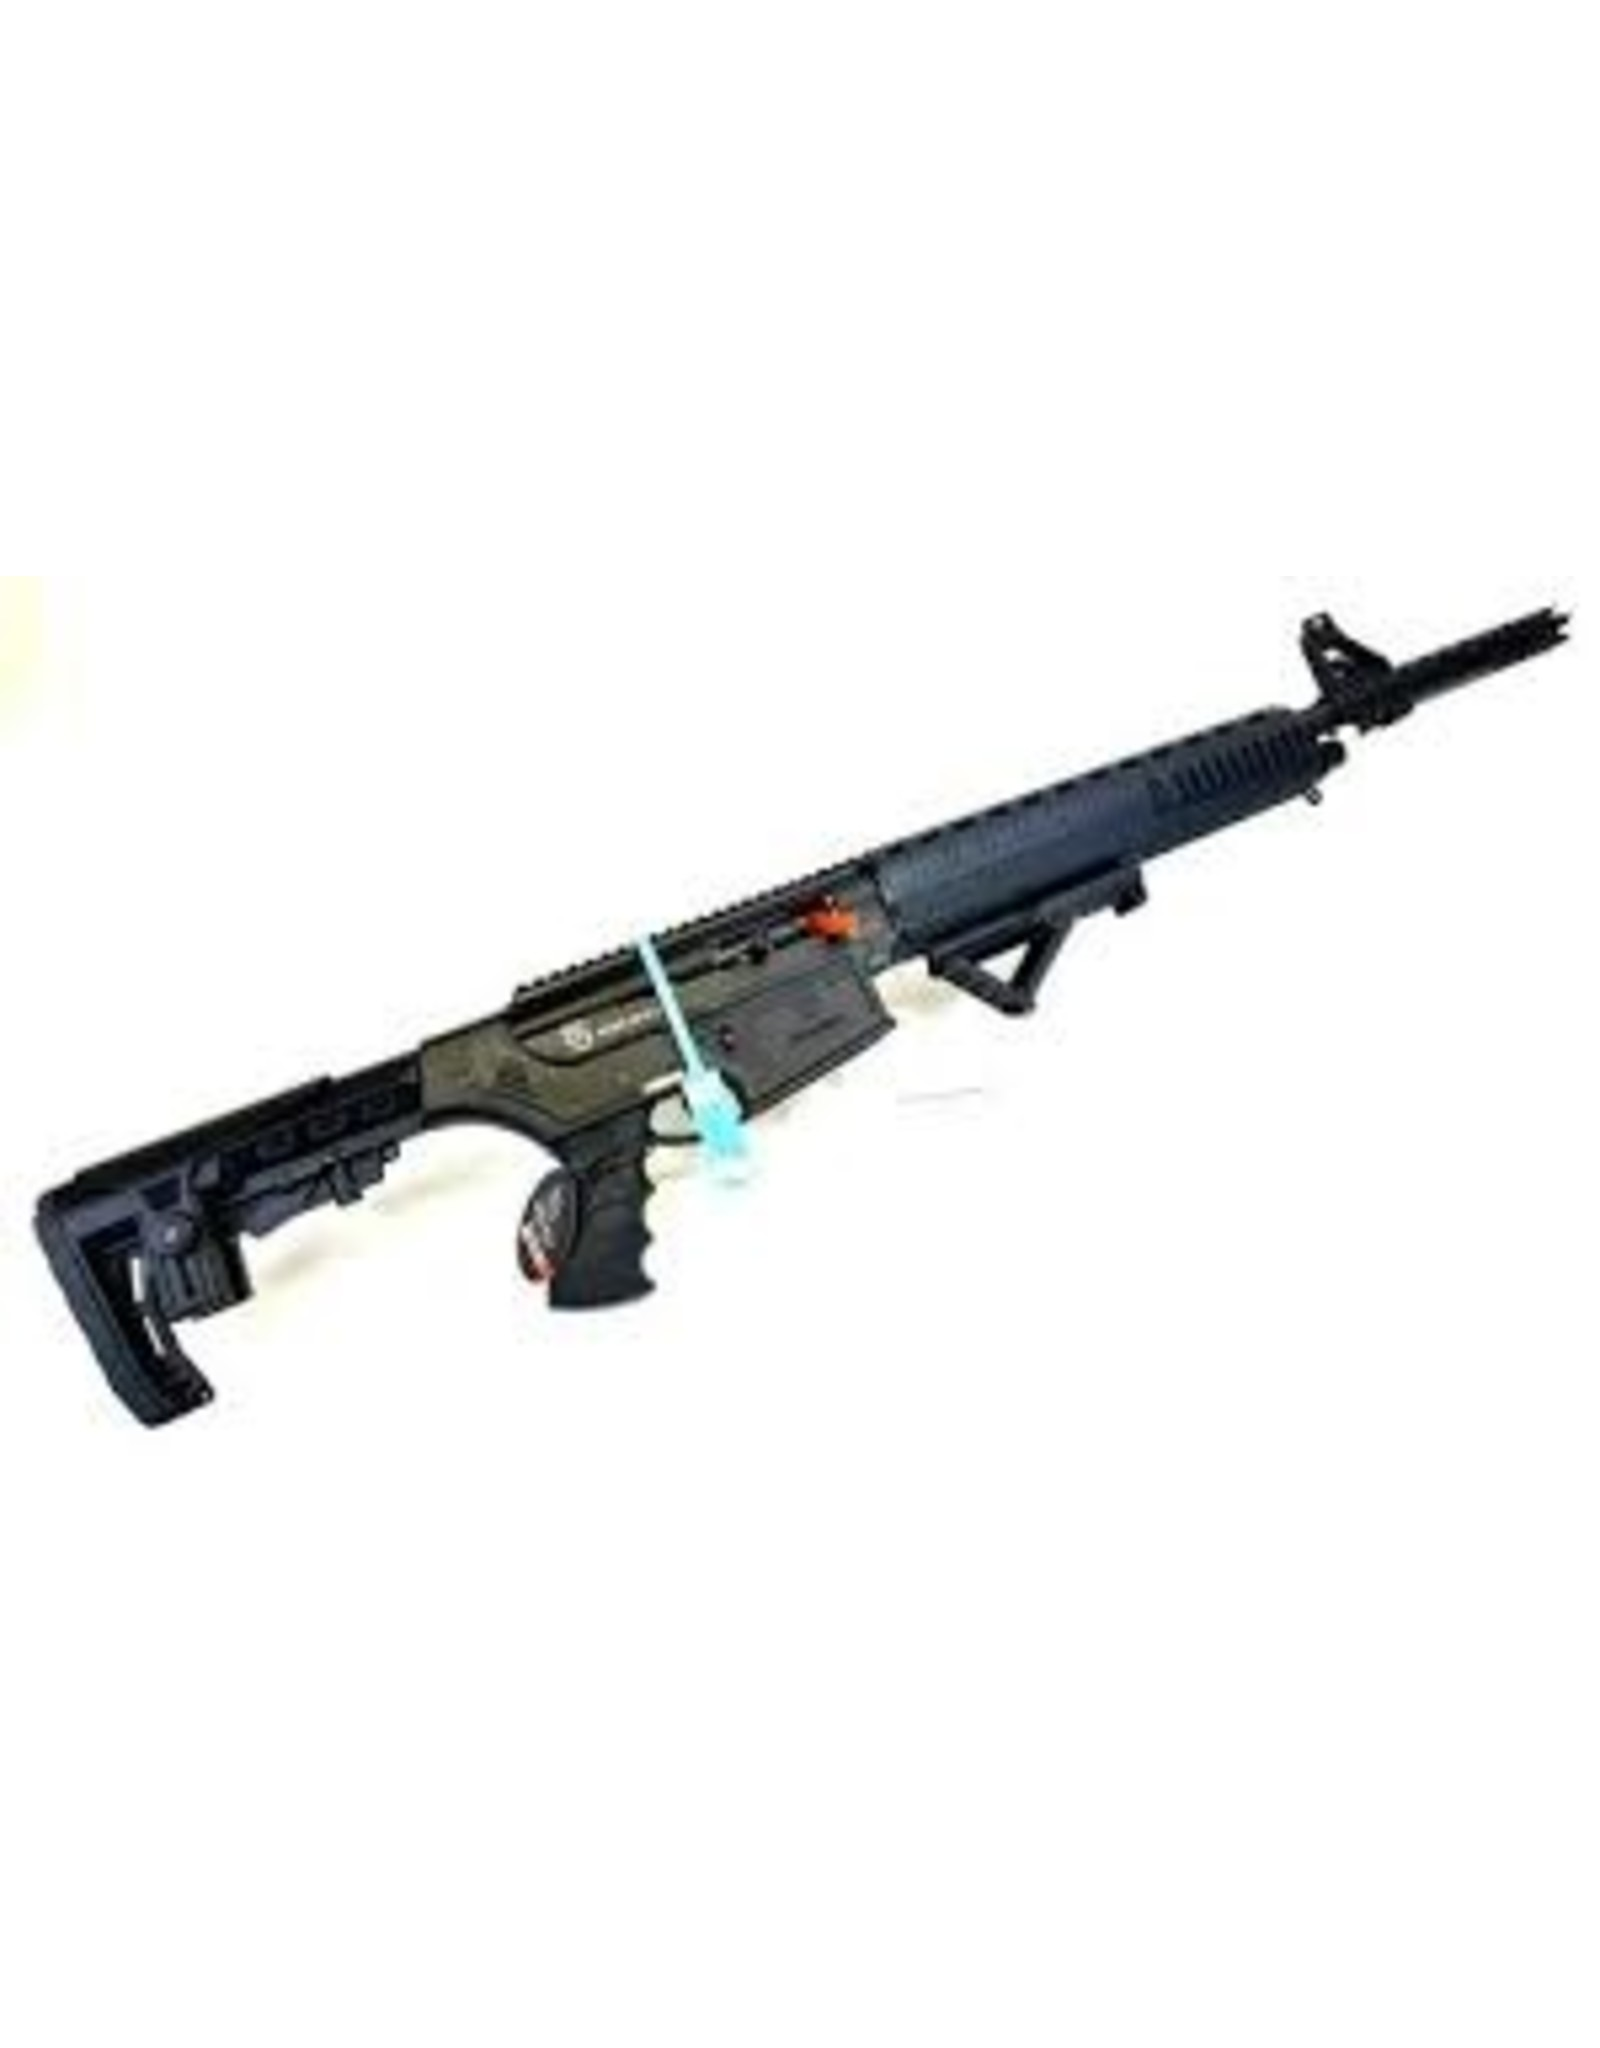 Balikli Balikli Makarov Turkey Shotgun Semi-Auto S12 12GA OD Green